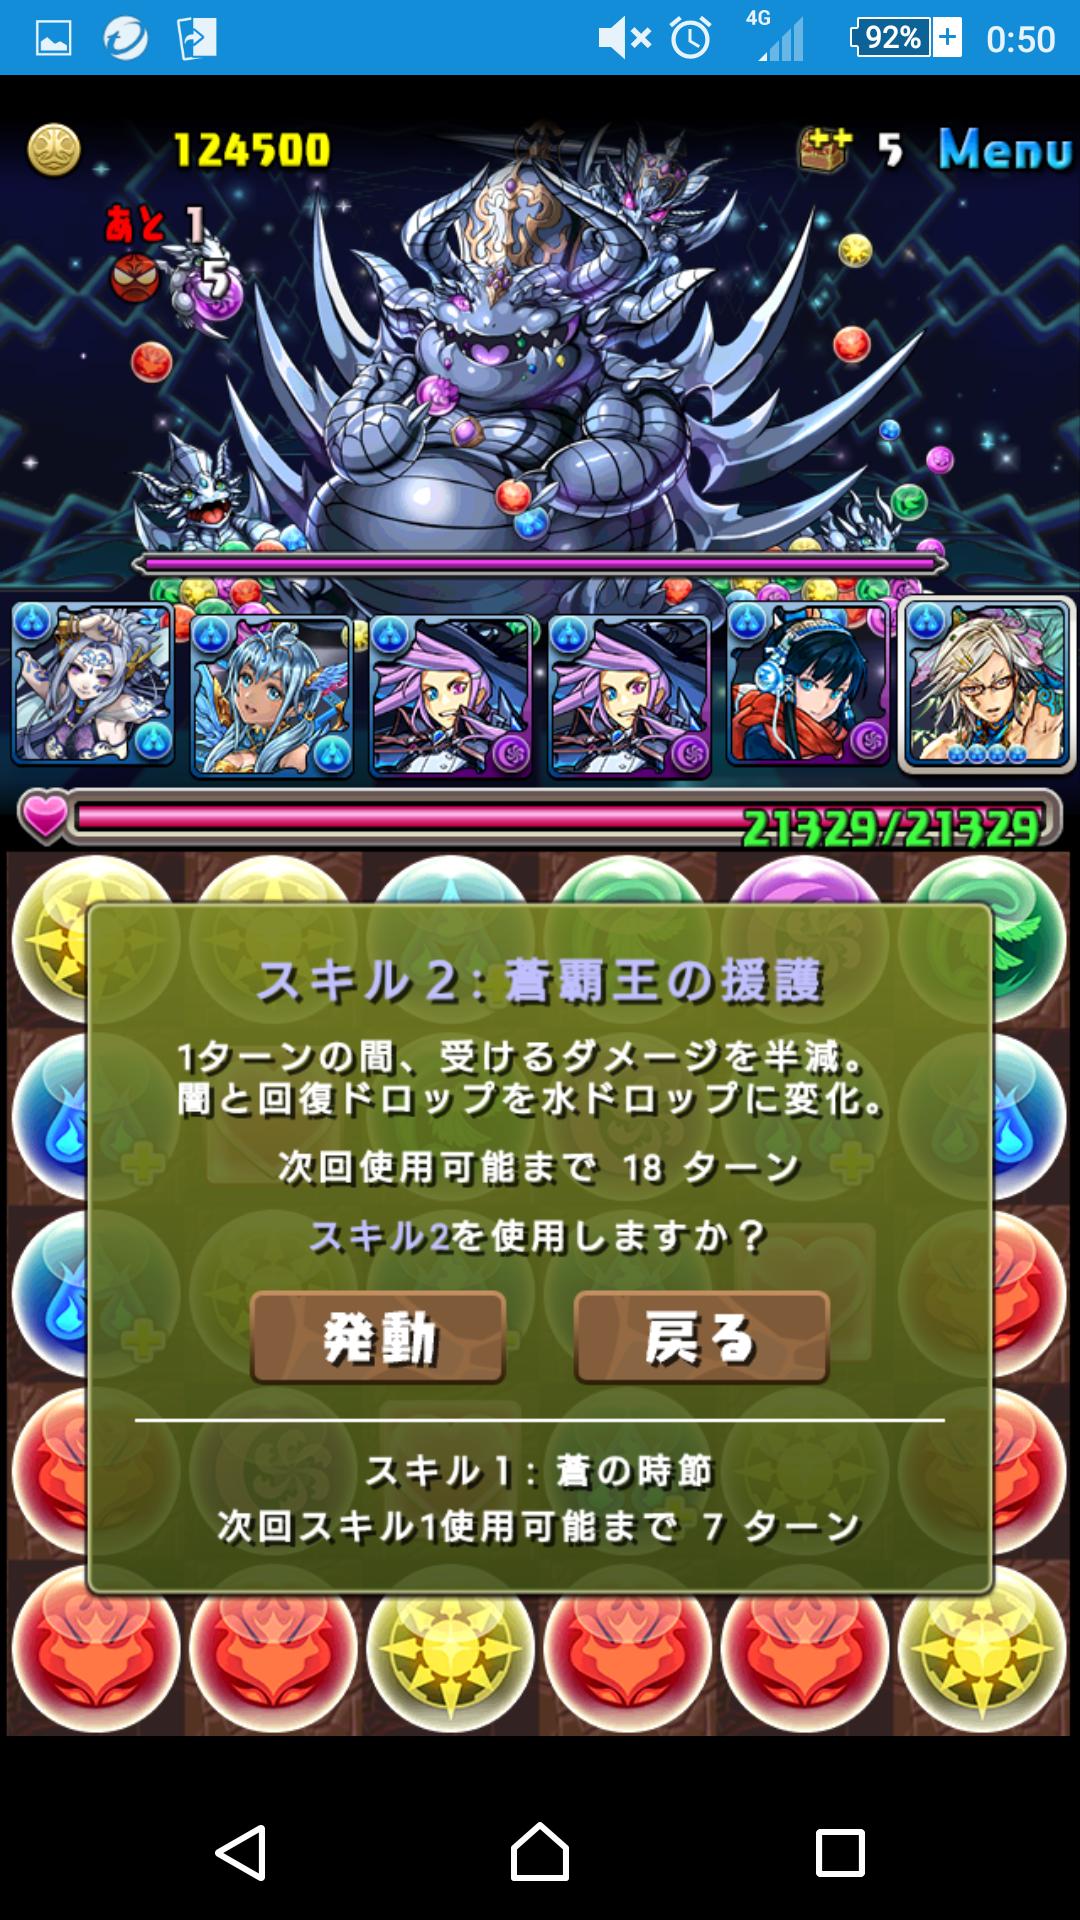 Screenshot_2016-05-16-00-50-18.png